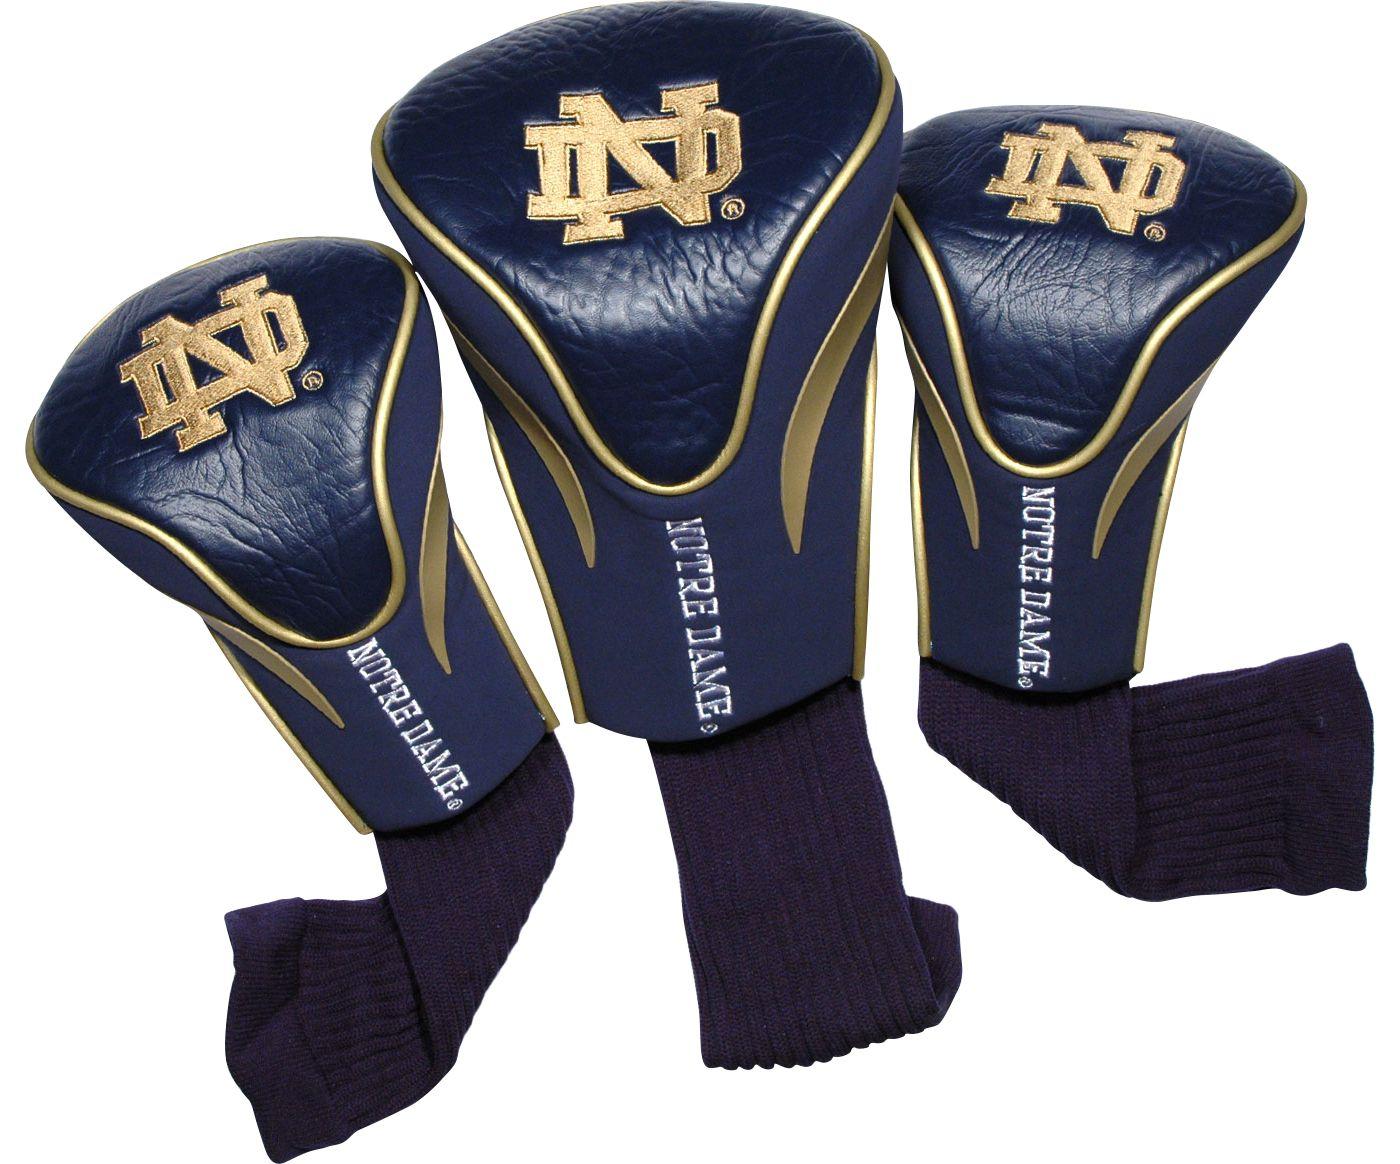 Team Golf Notre Dame Fighting Irish Contour Headcovers - 3-Pack